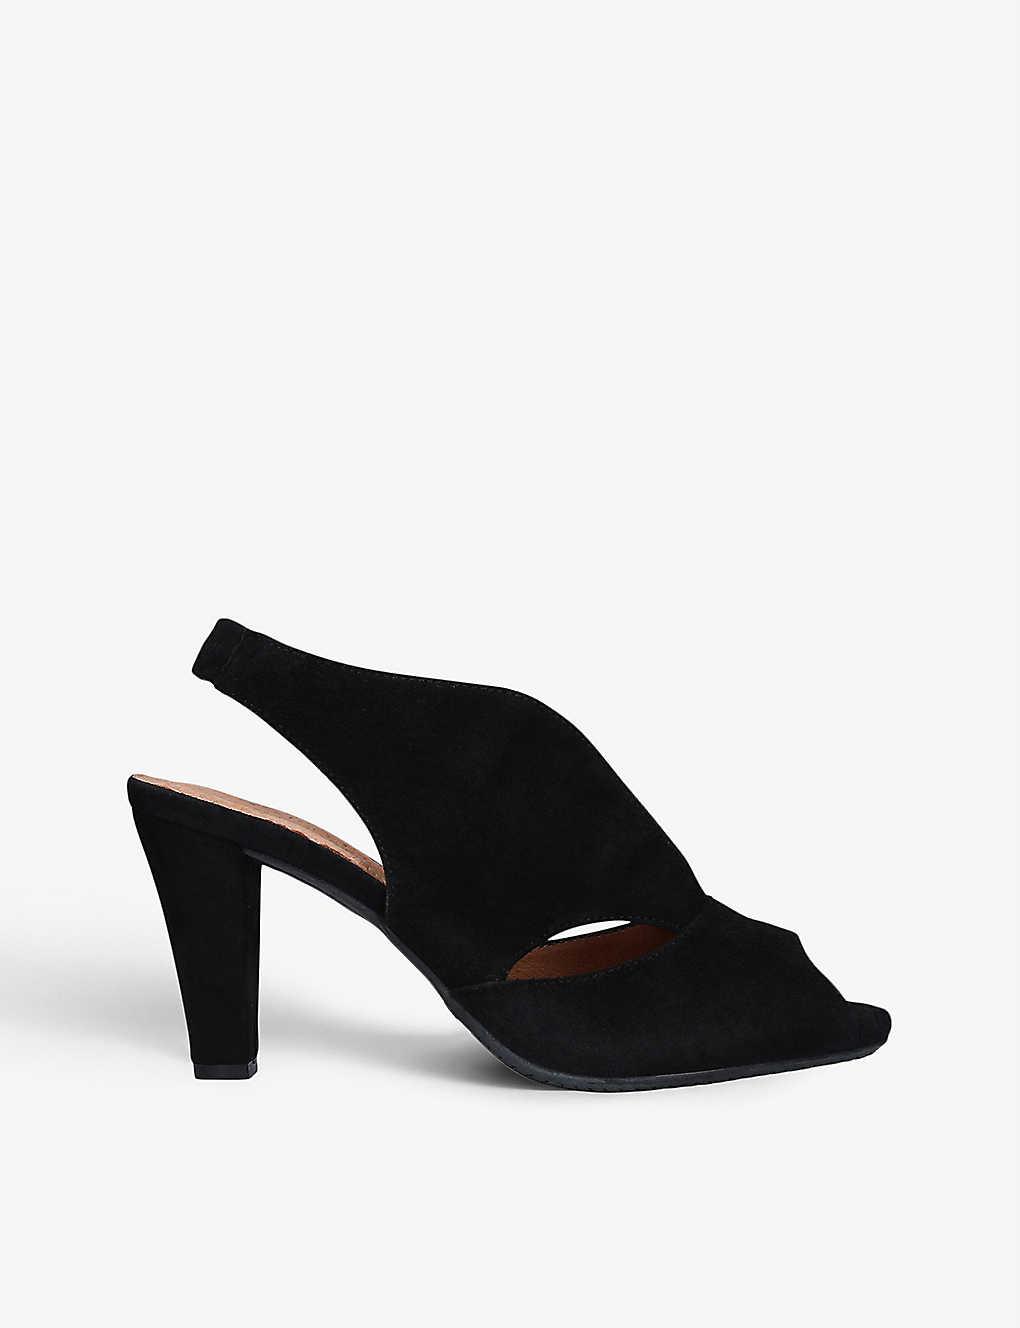 6e67d3b079 CARVELA COMFORT - Arabella cutout heeled suede sandals | Selfridges.com